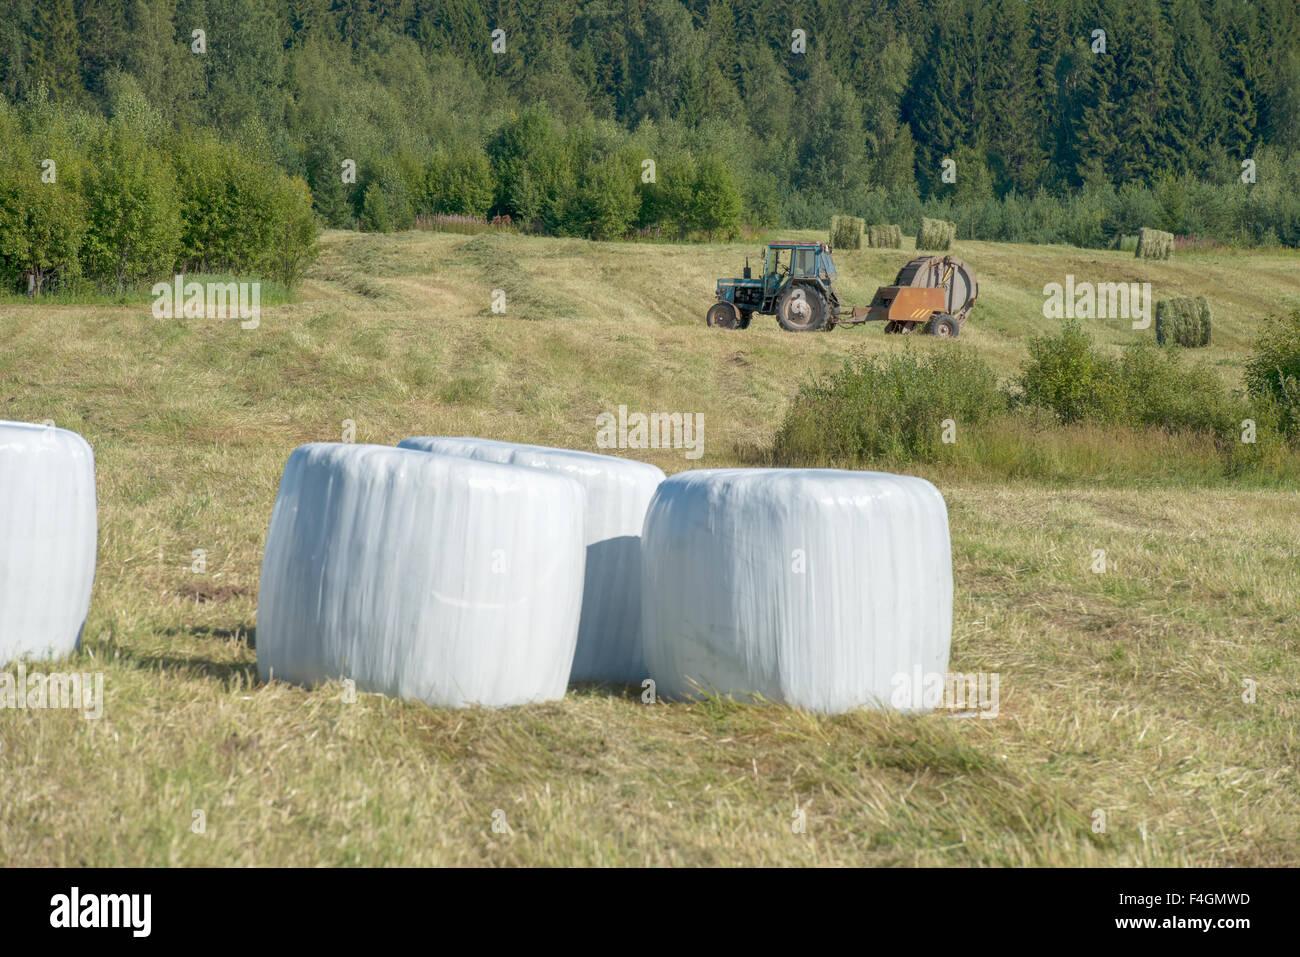 Bales Of Plastic Stock Photos Amp Bales Of Plastic Stock